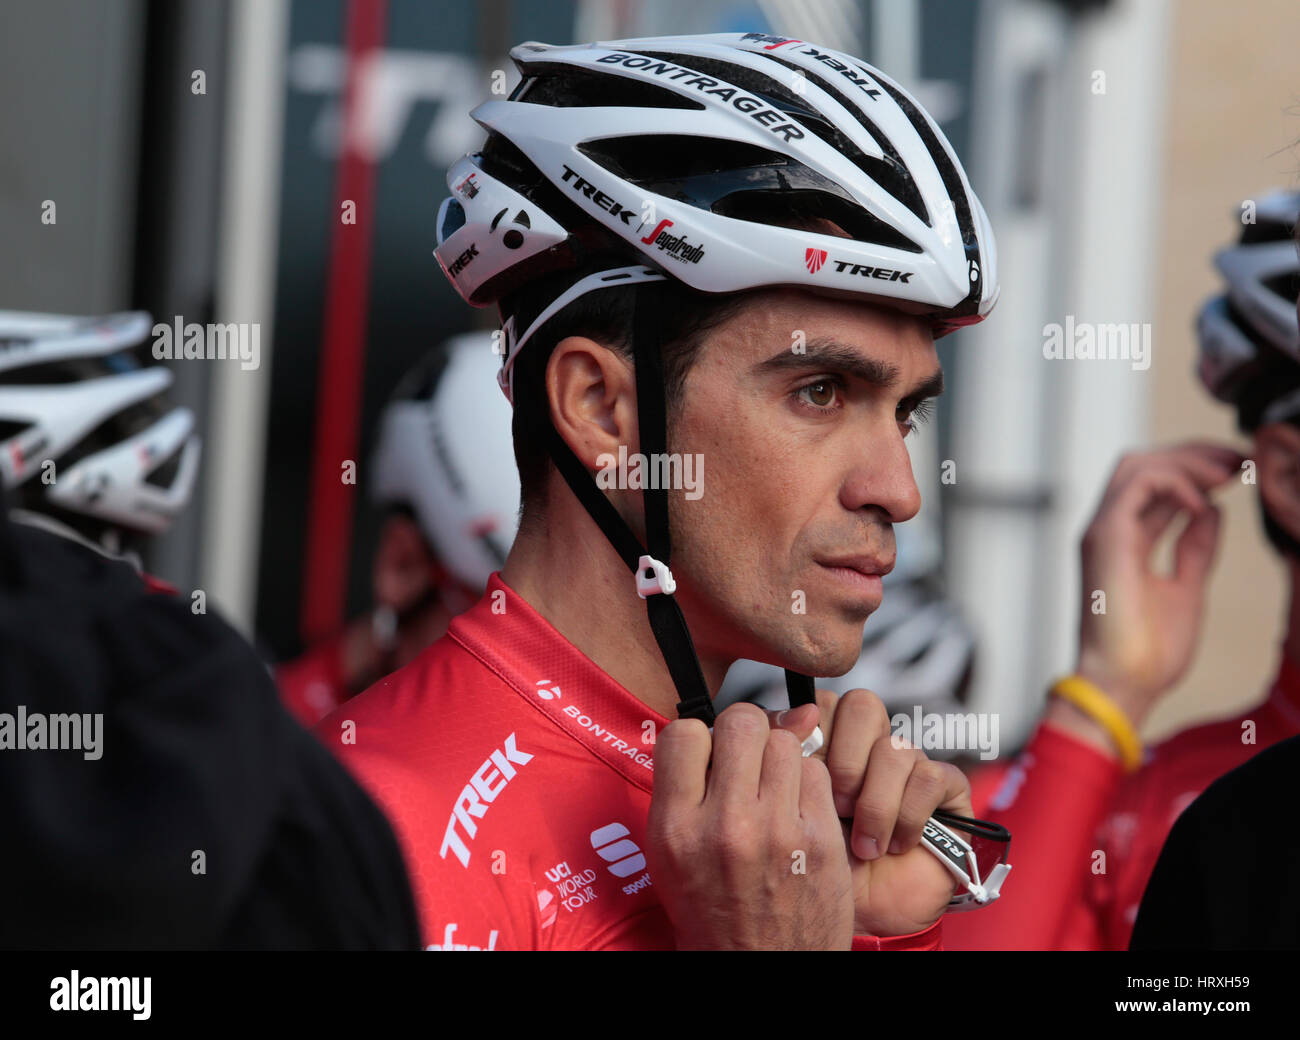 9ef5fd8cd Alberto Contador adjust his helmet with his new team jersey Trek Segafredo  before a training session in the island of Majorca